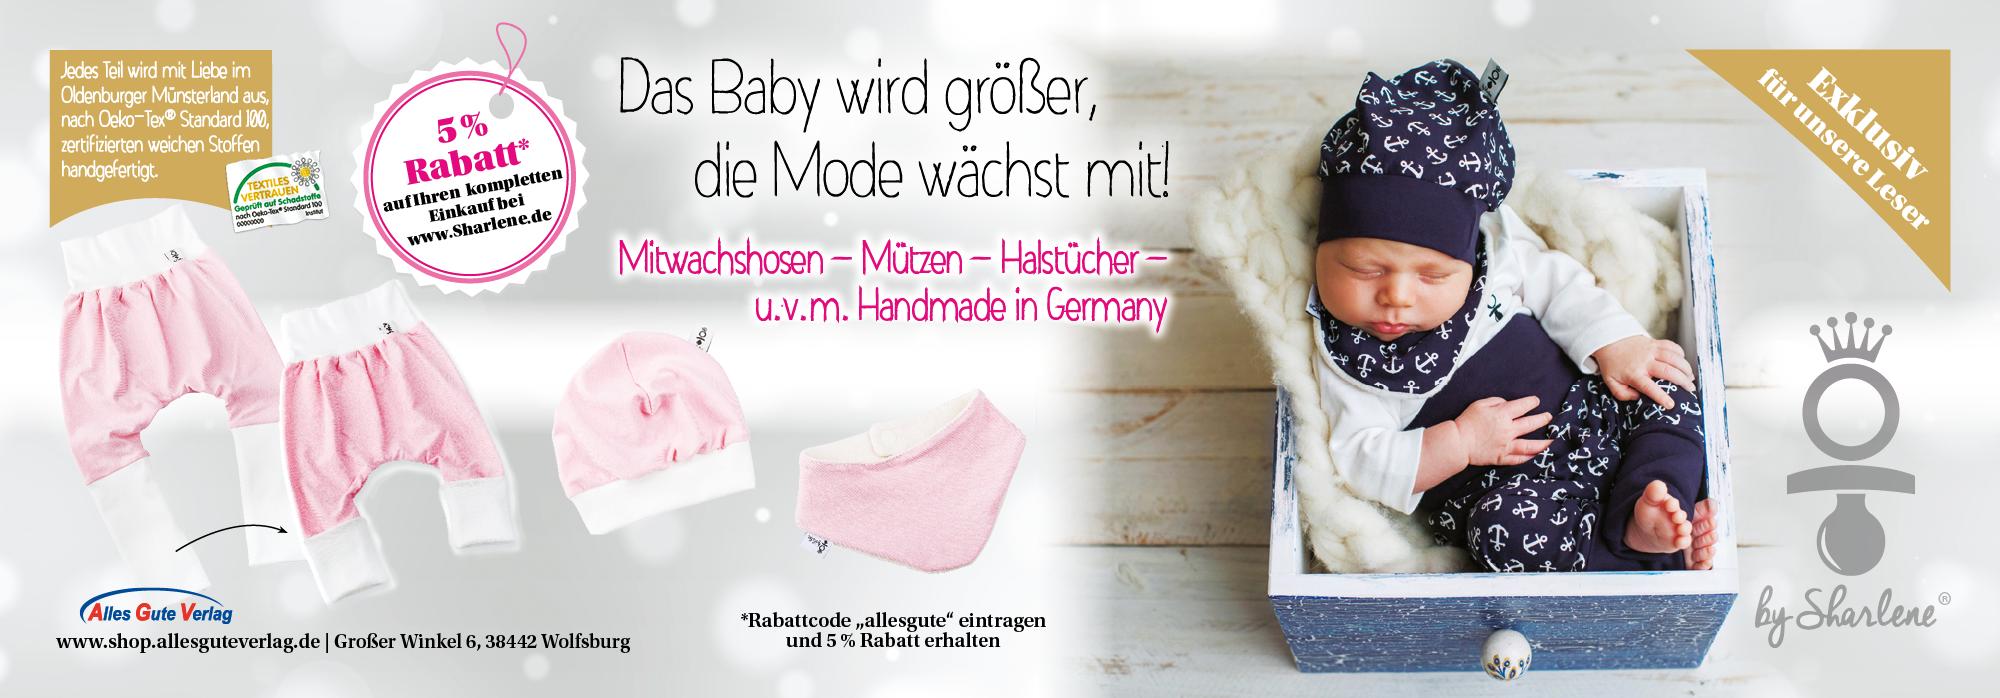 Sharlene® Babymode